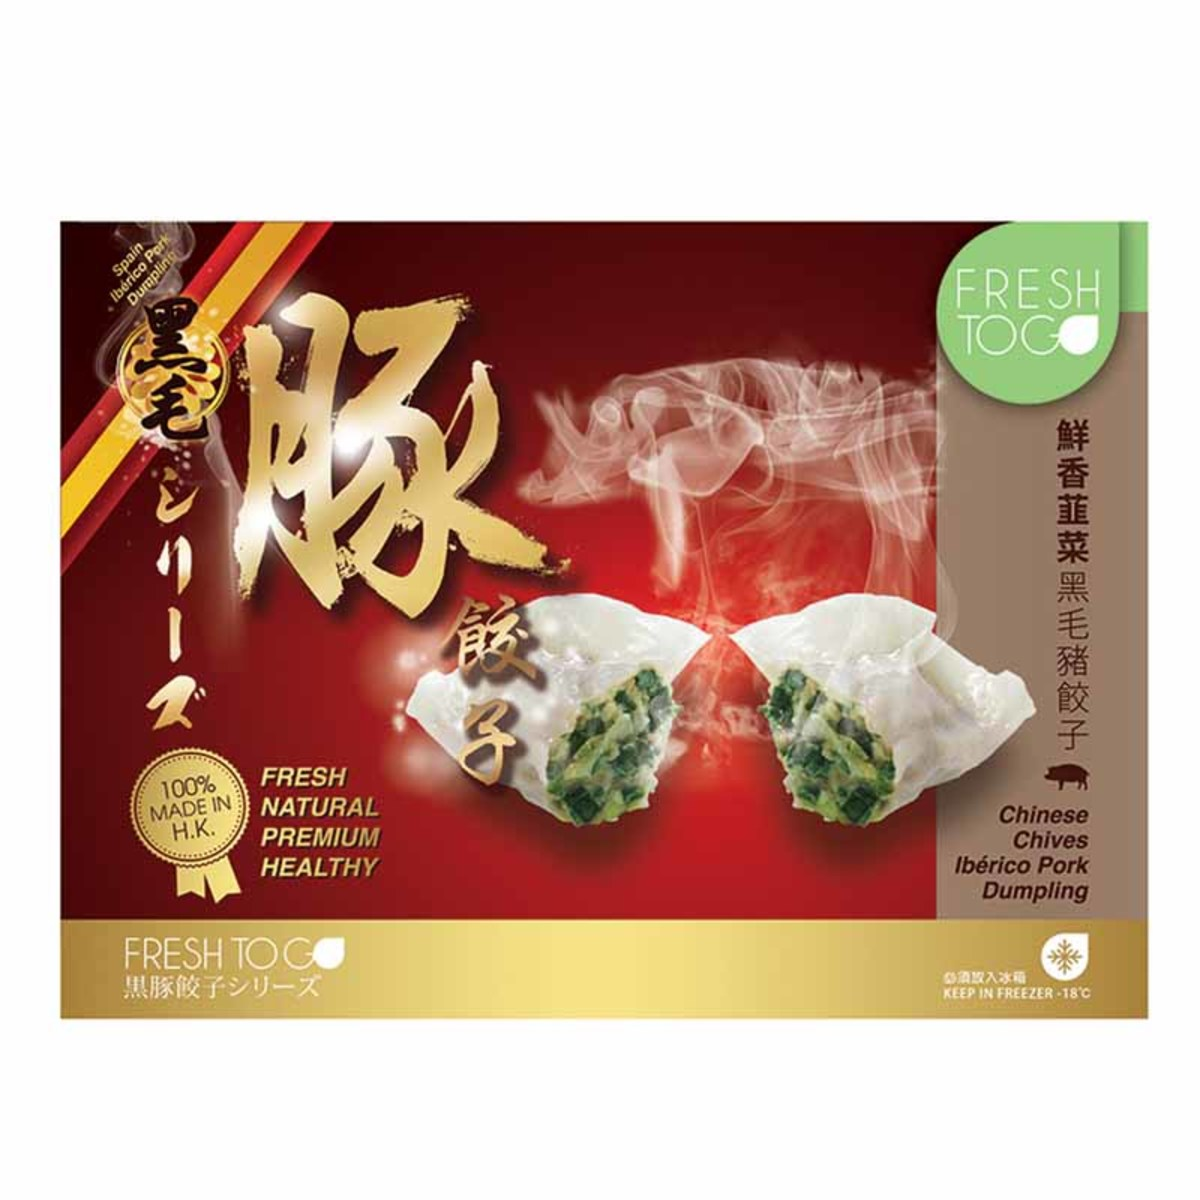 Chinese Chives Iberico Pork Dumpling